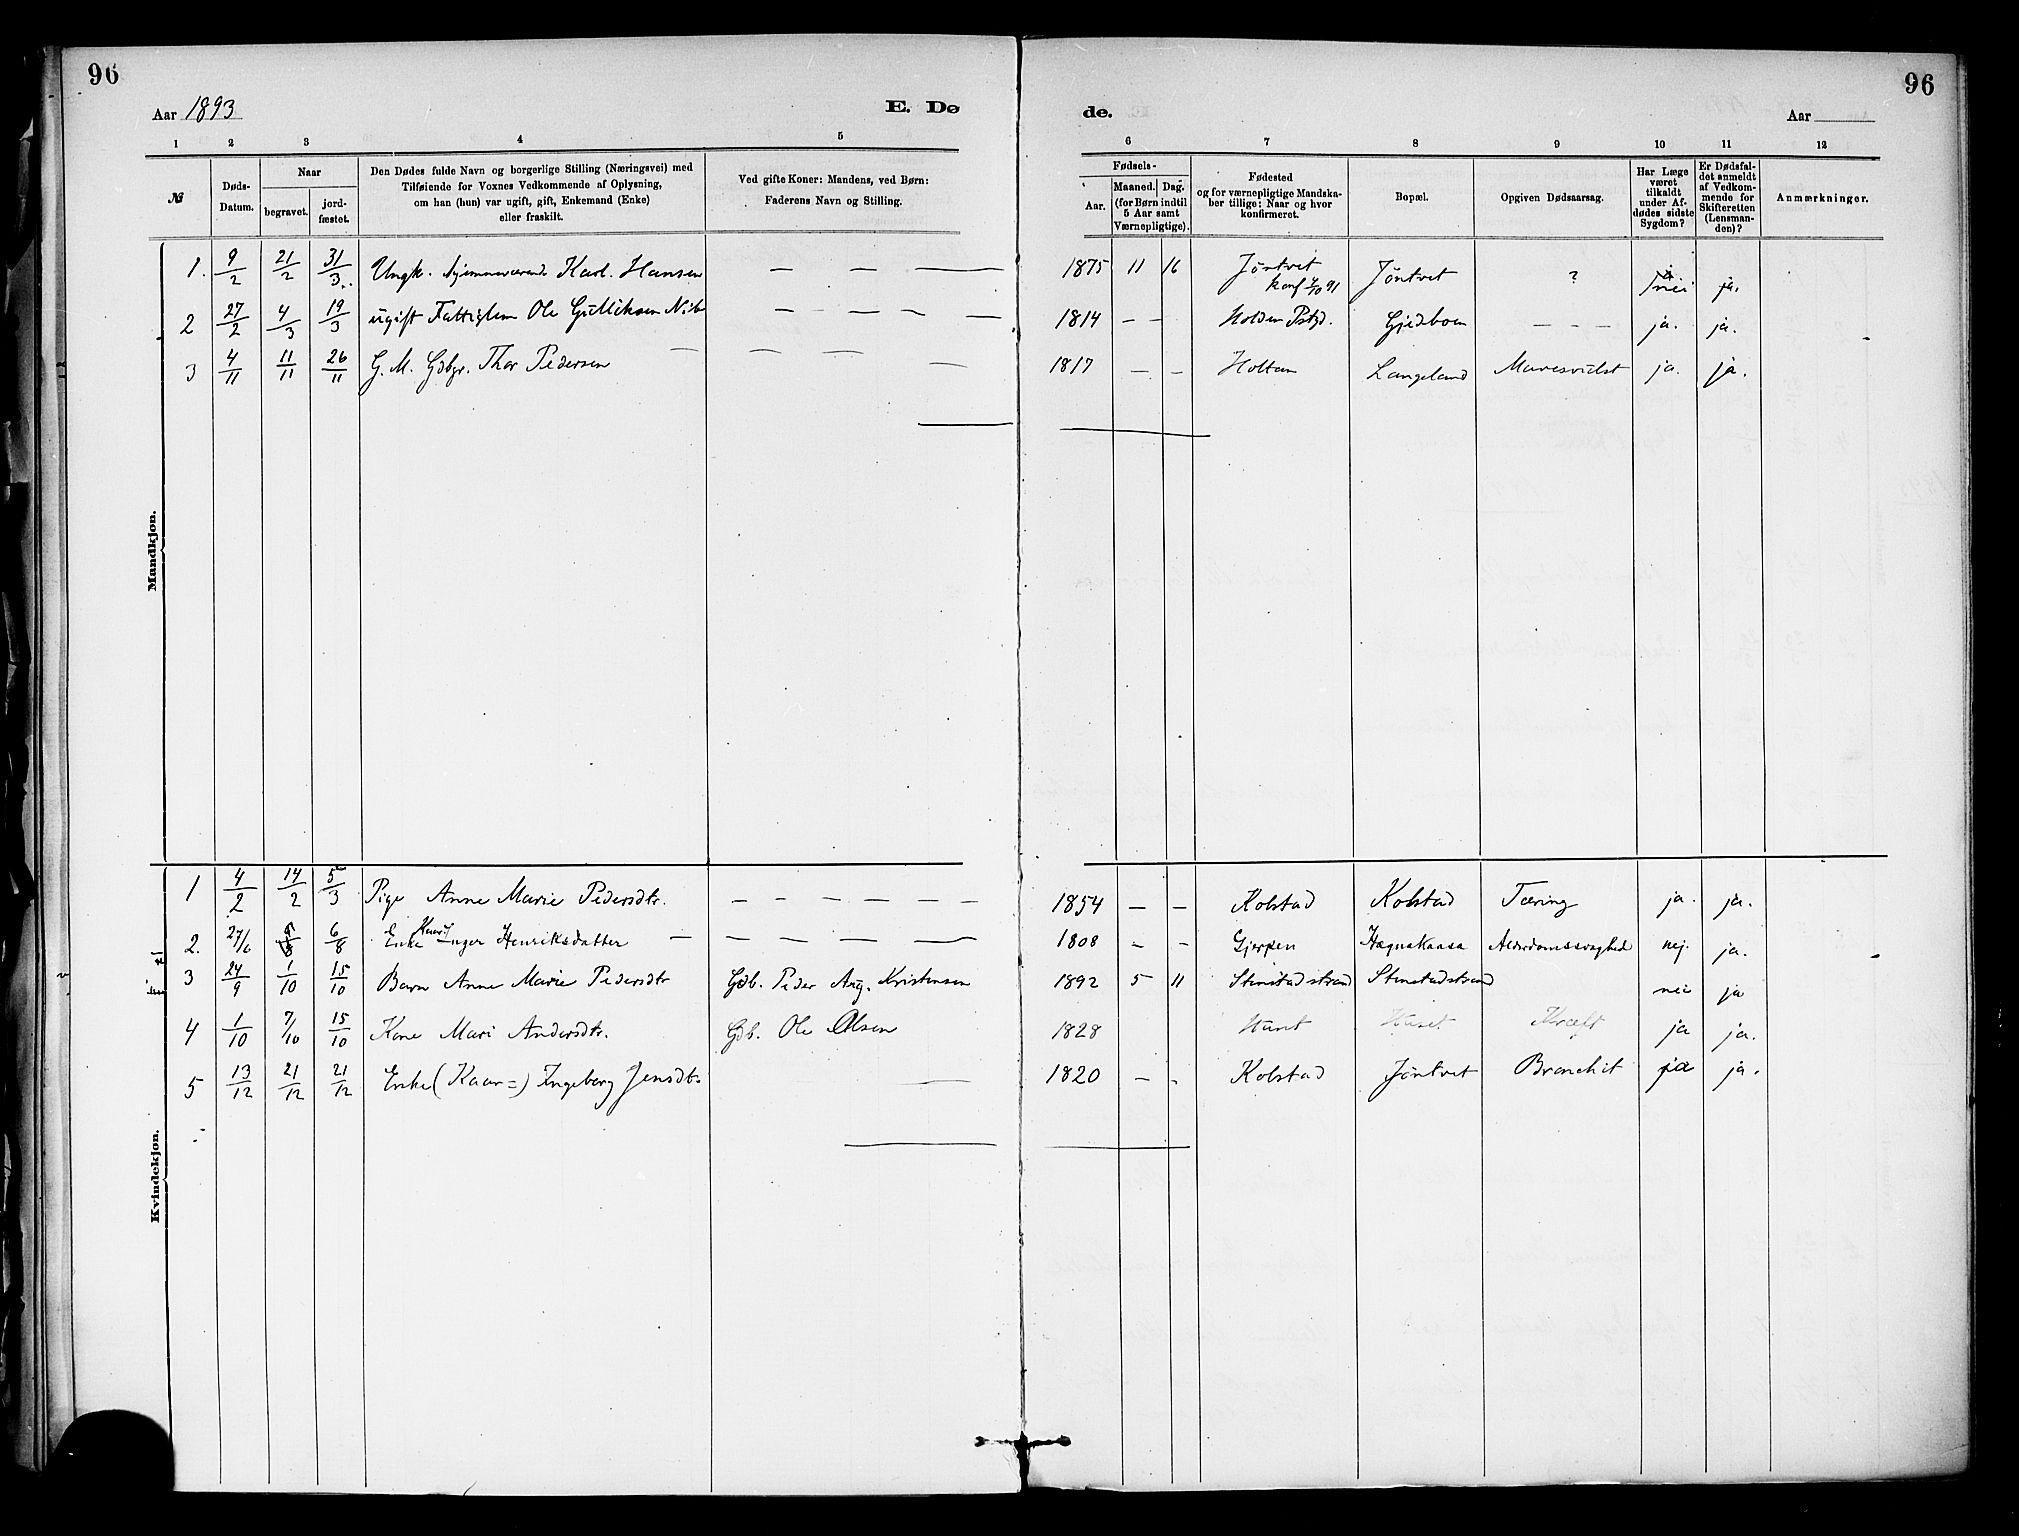 SAKO, Holla kirkebøker, F/Fa/L0009: Ministerialbok nr. 9, 1881-1897, s. 96